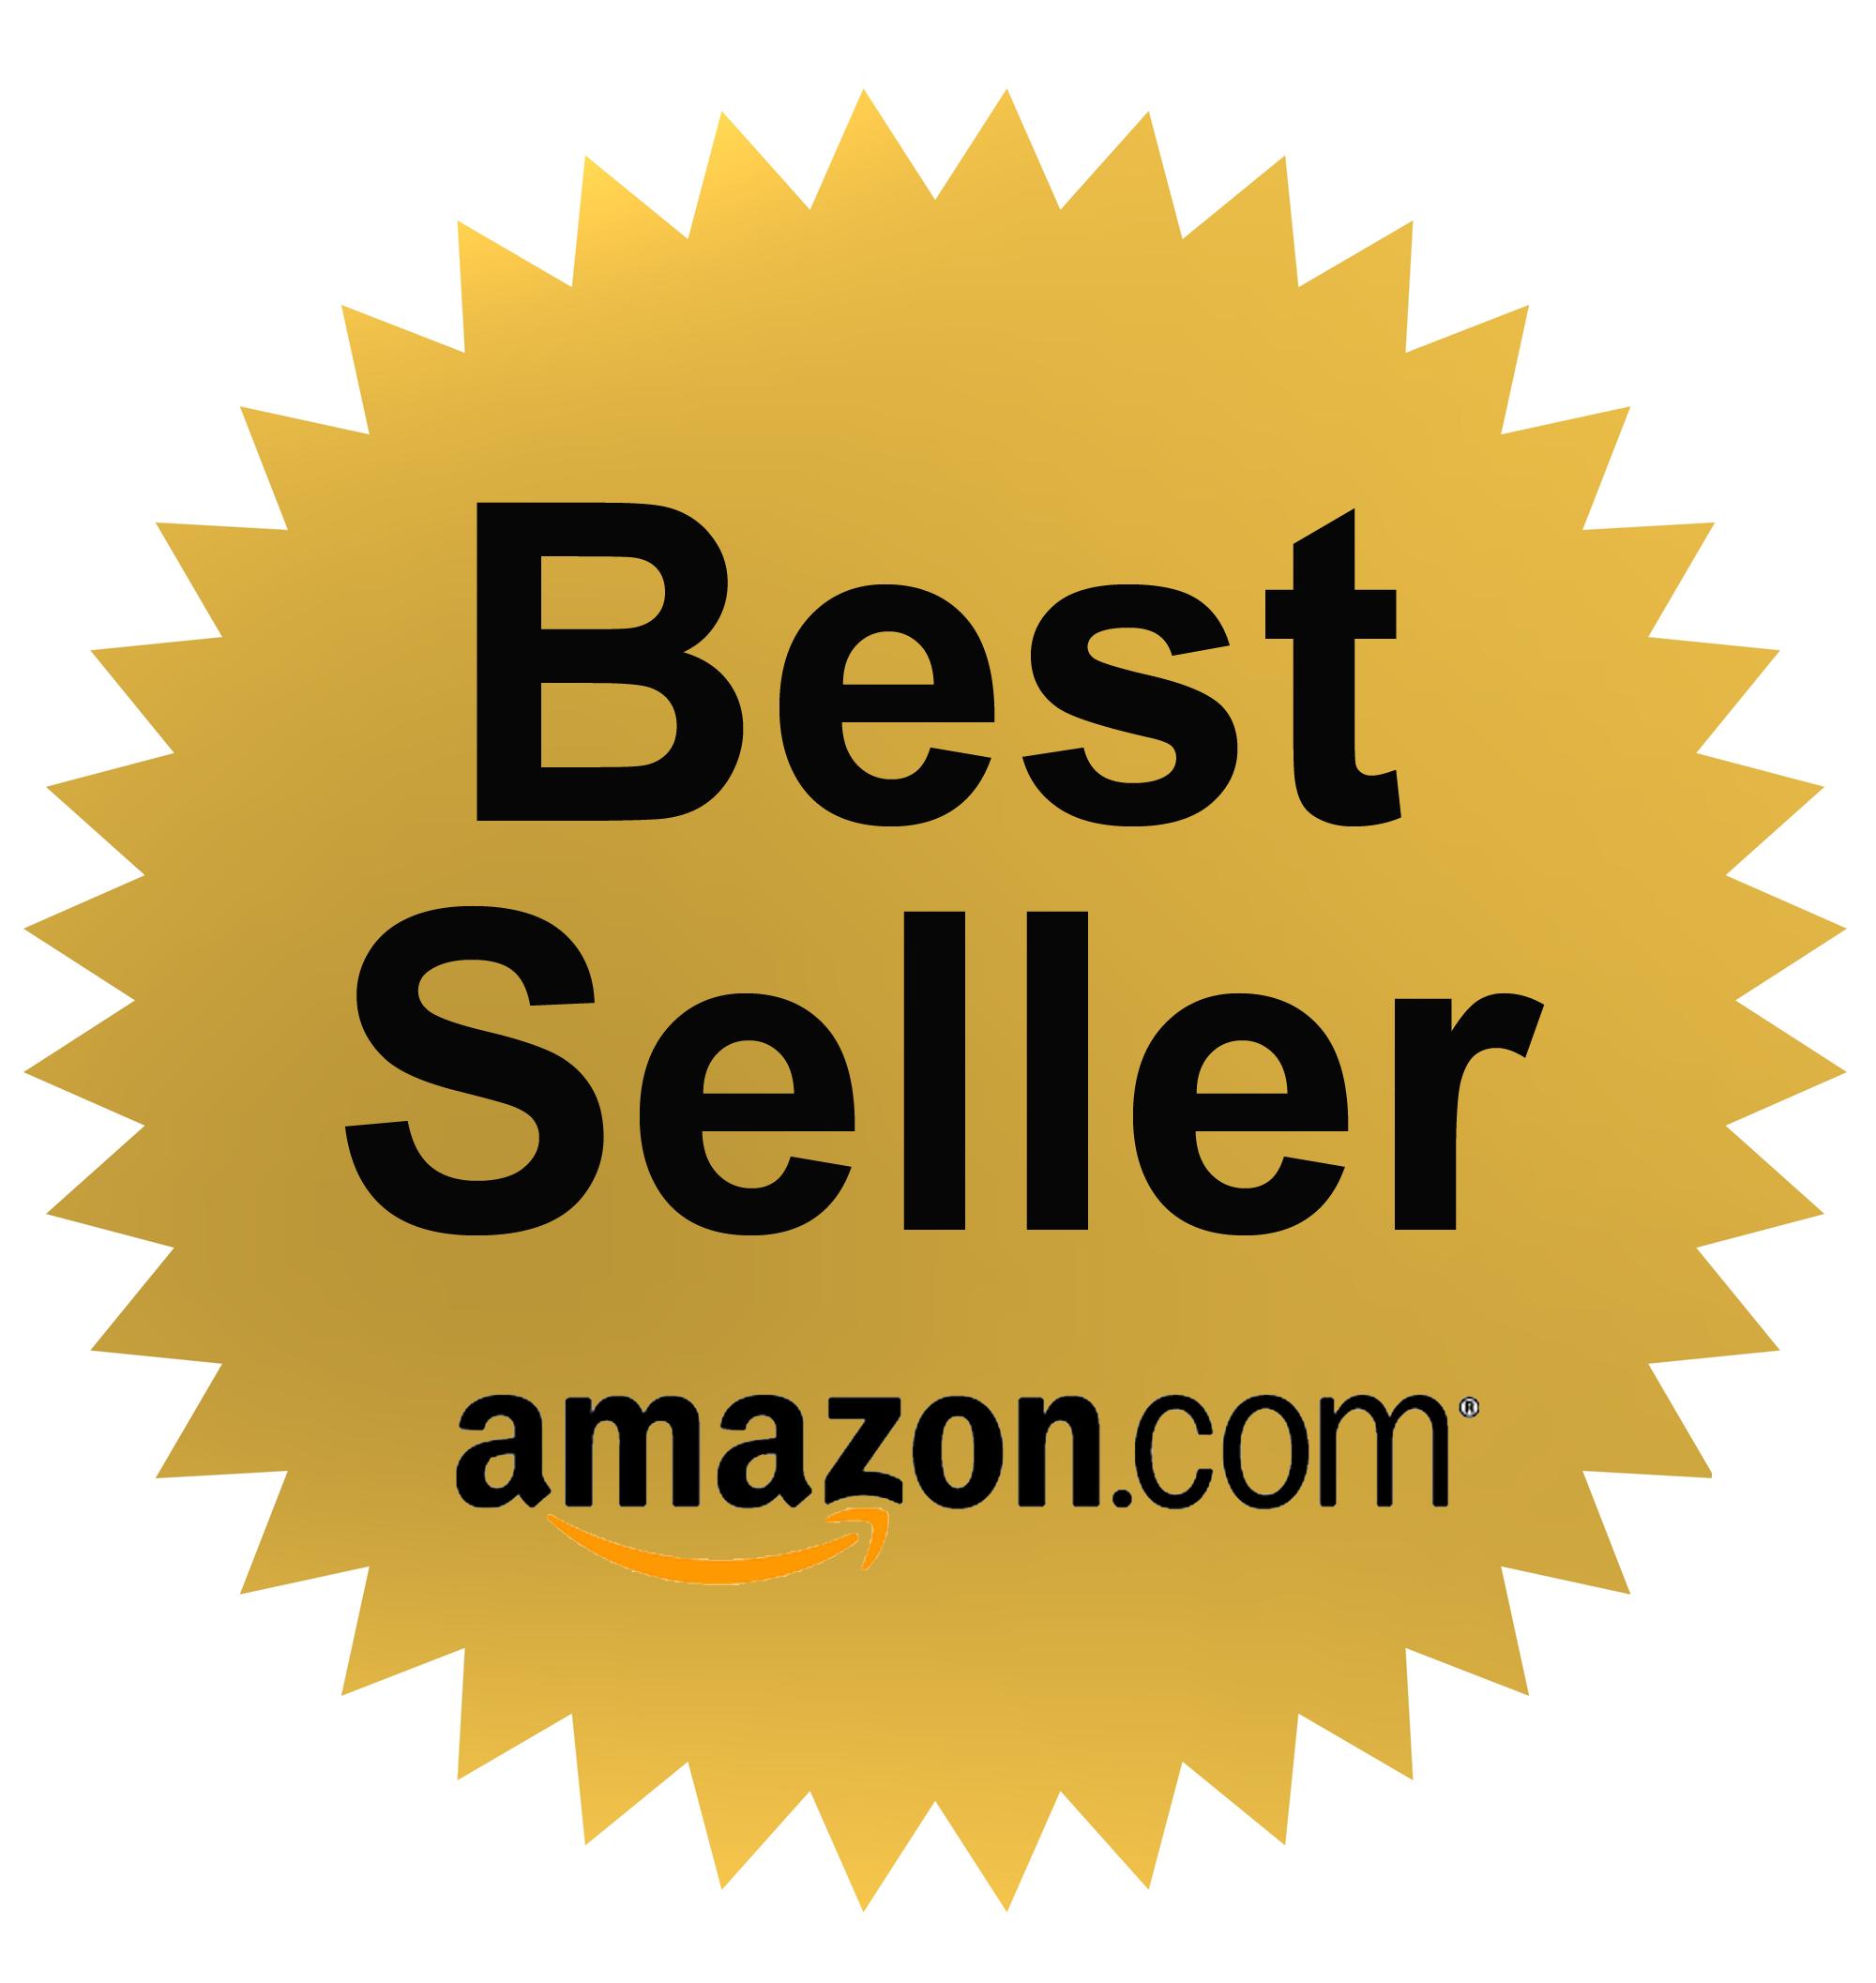 Understanding the Amazon Best Seller Rankings